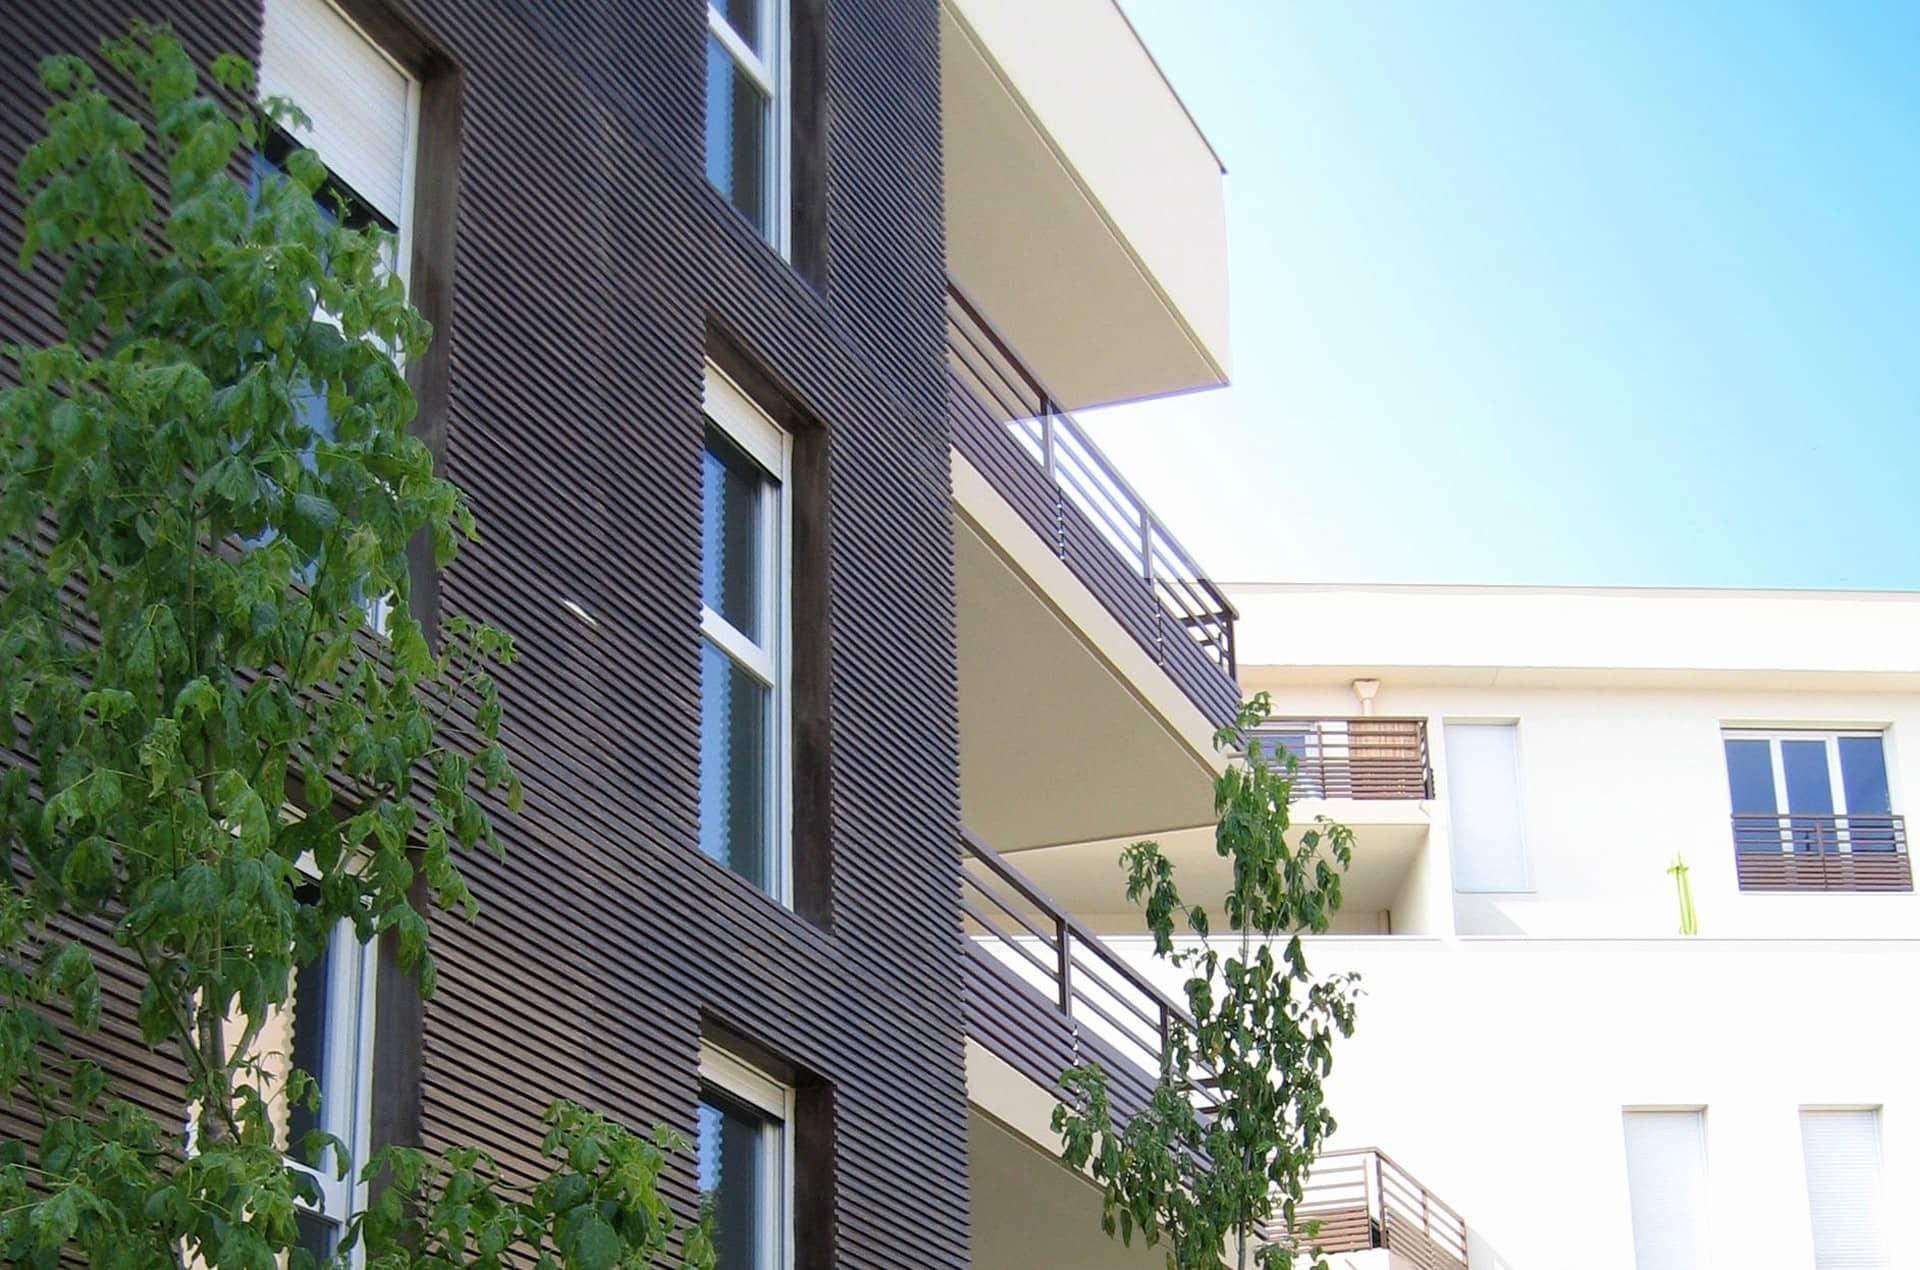 architec-domremy-facade-terrasse-logements